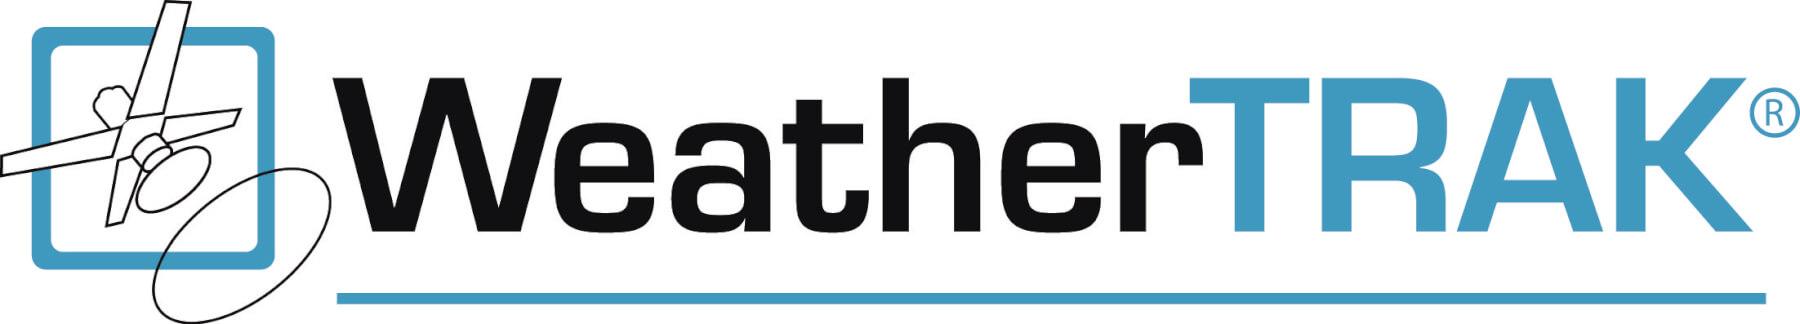 WeatherTRAK logo_notagline